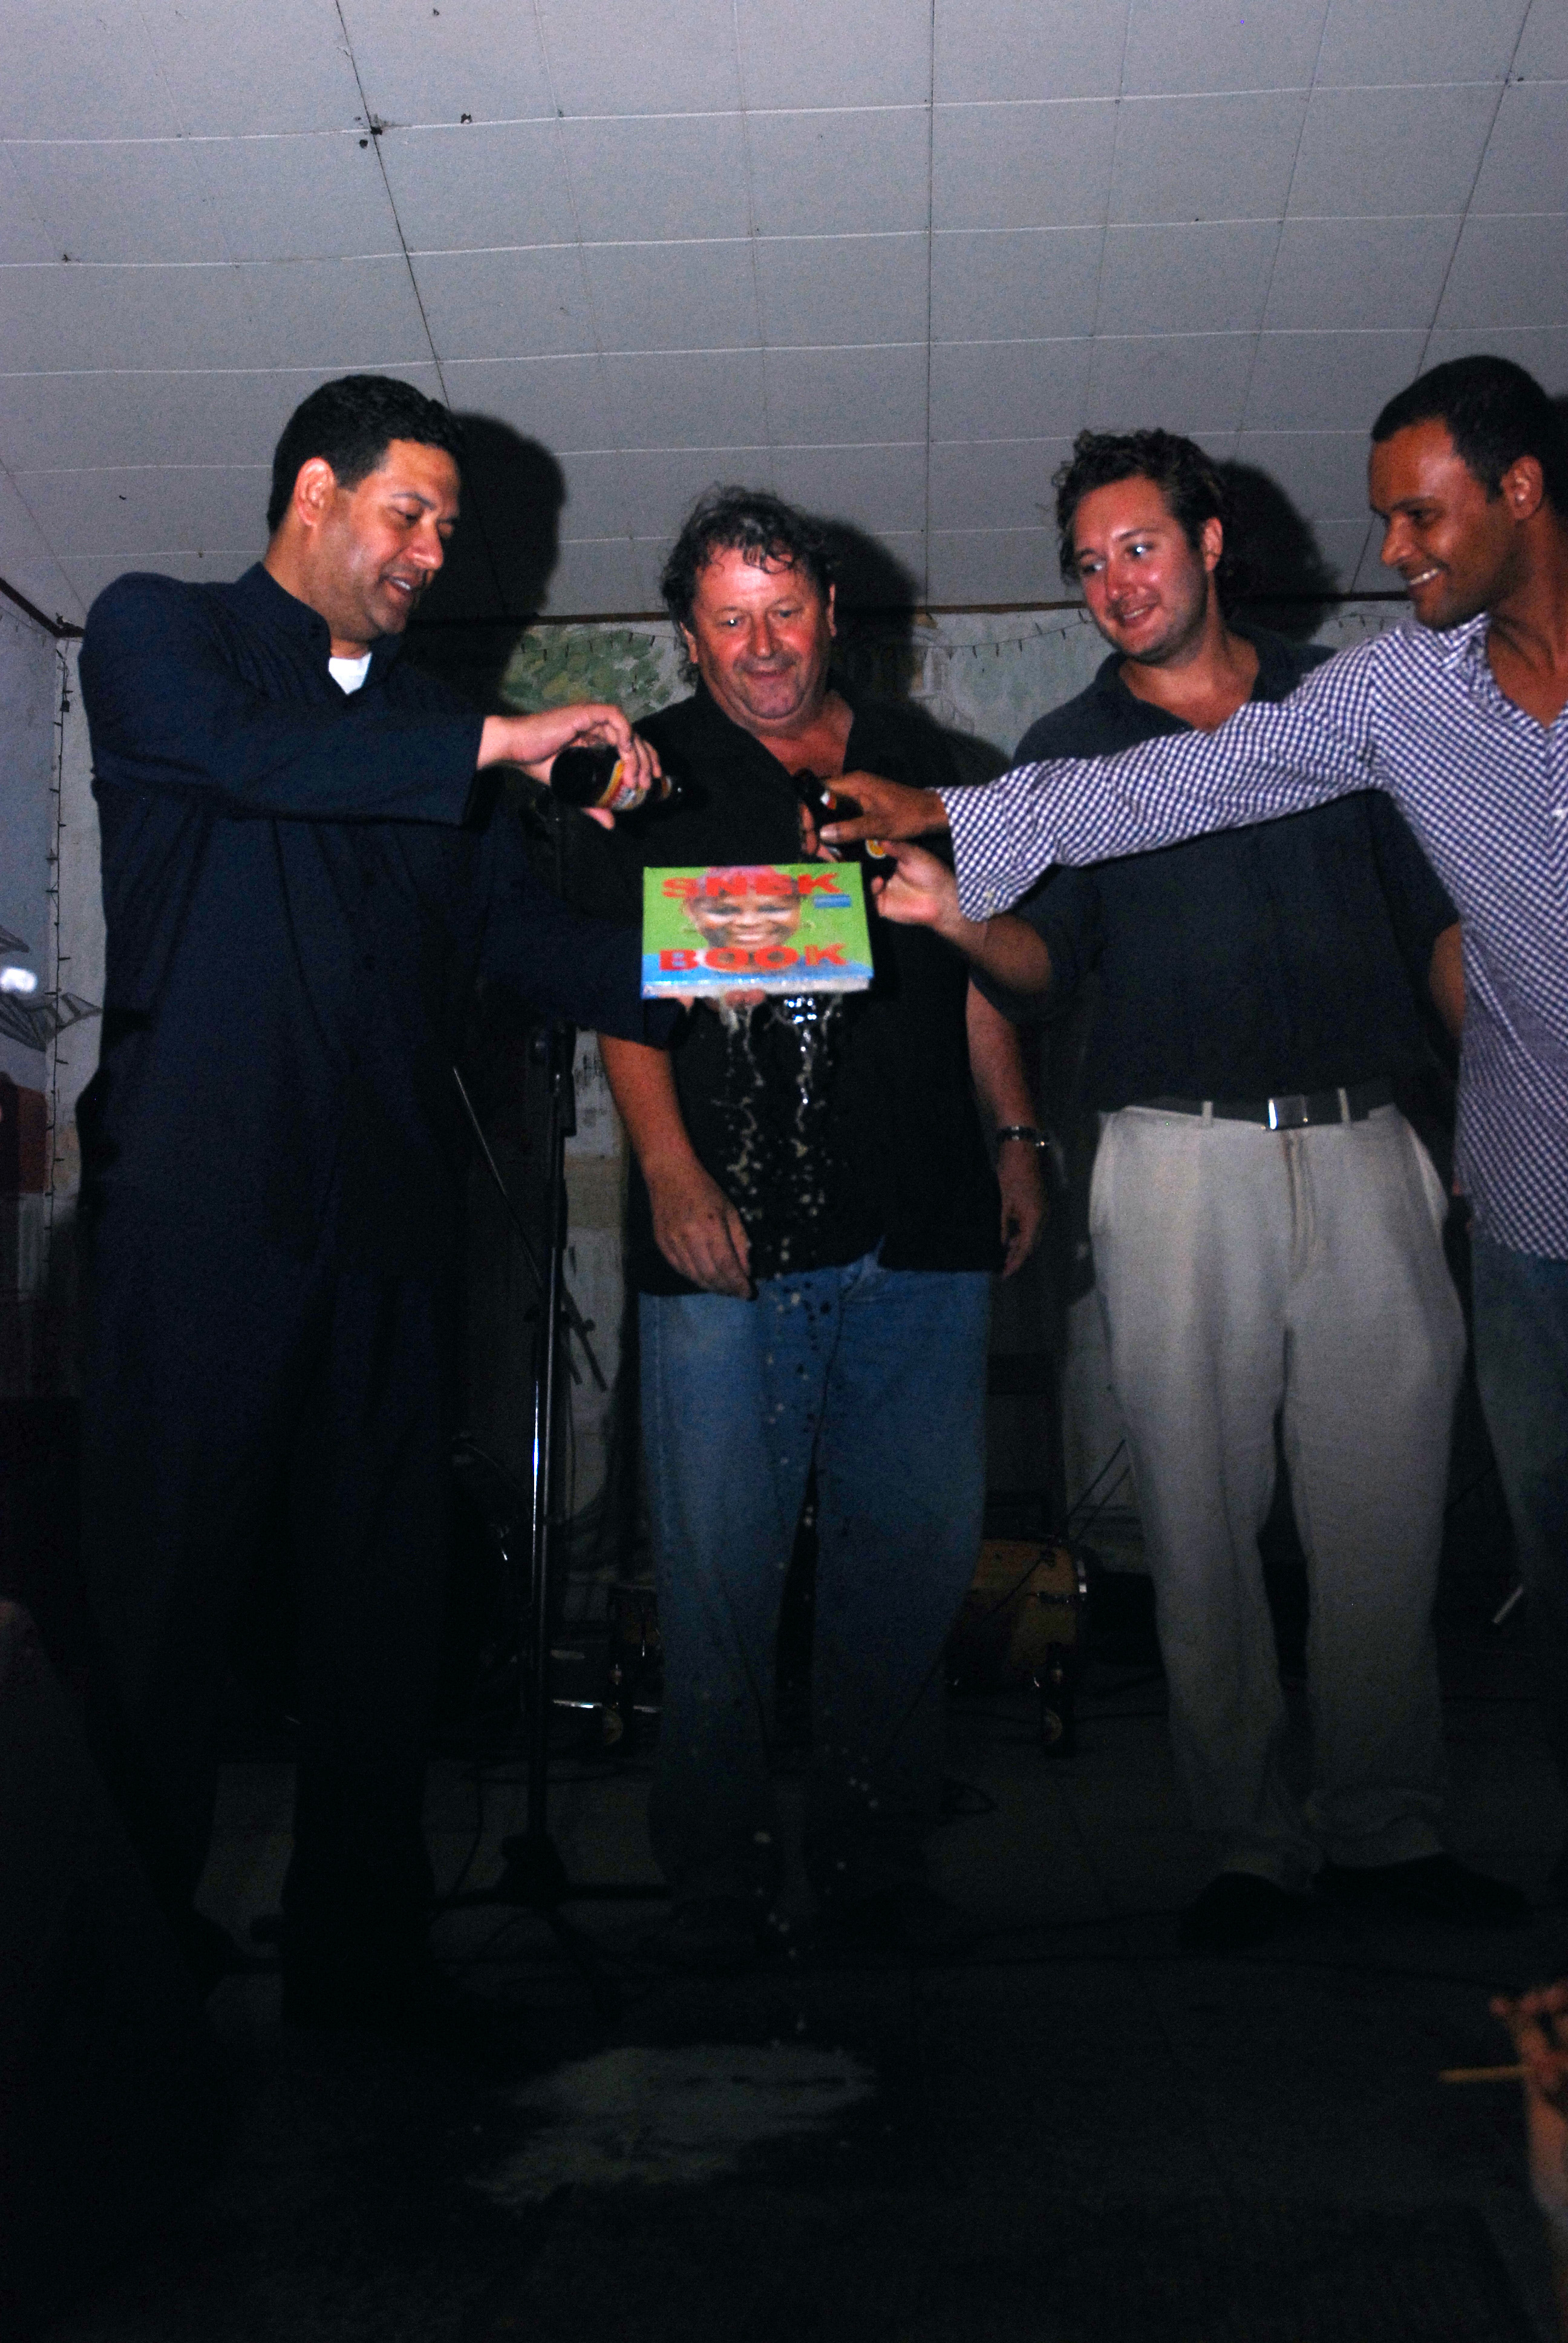 Snèkbook, 2008